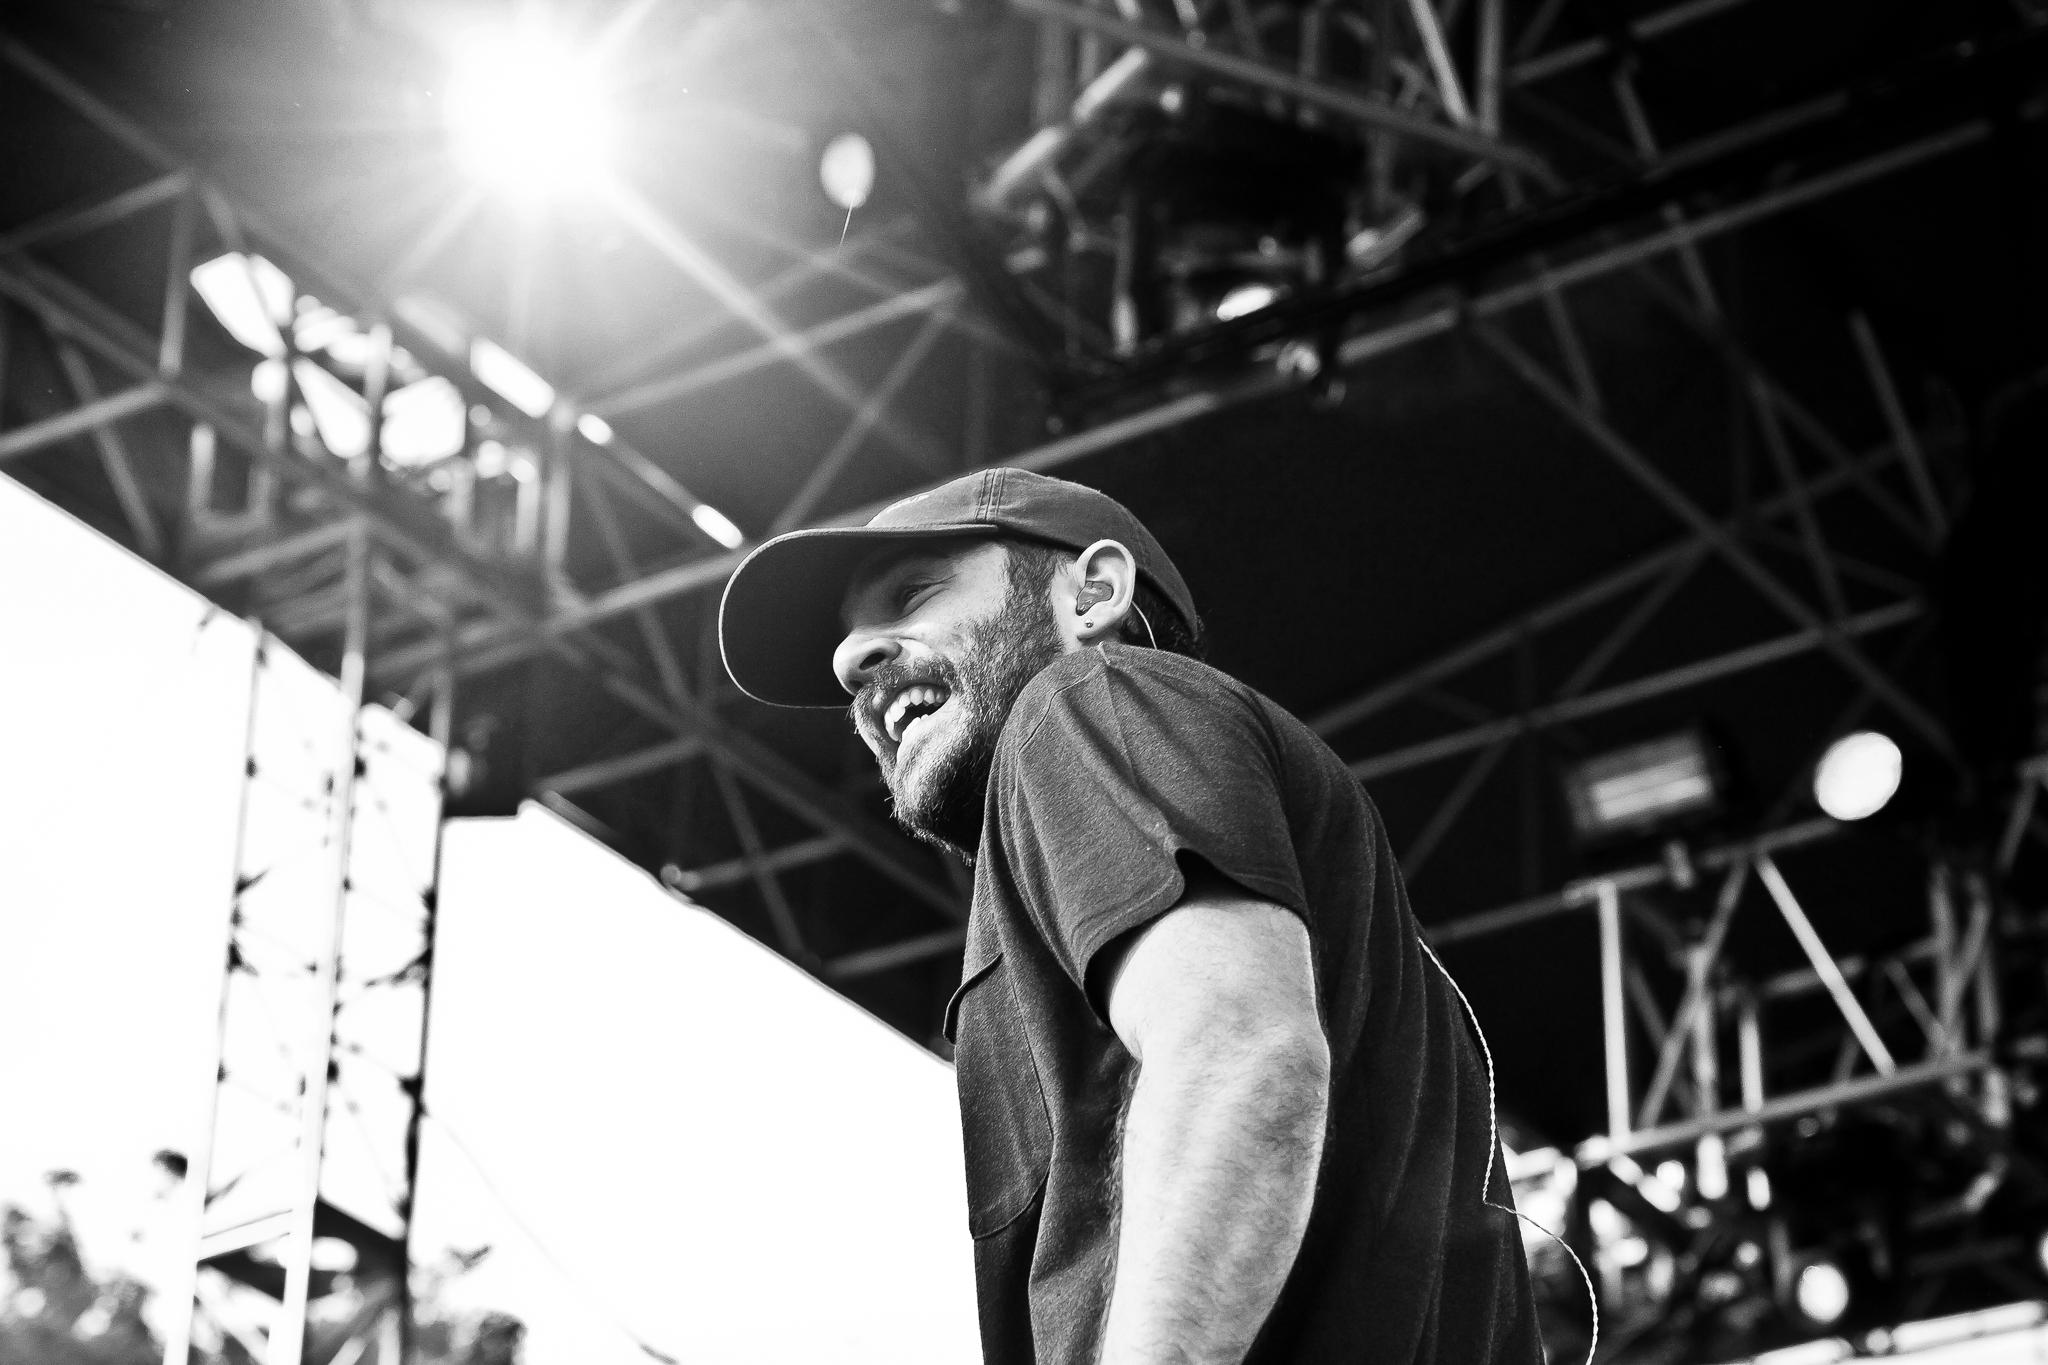 Jon Bellion performing at Bunbury. Shot for Ellenwood EP